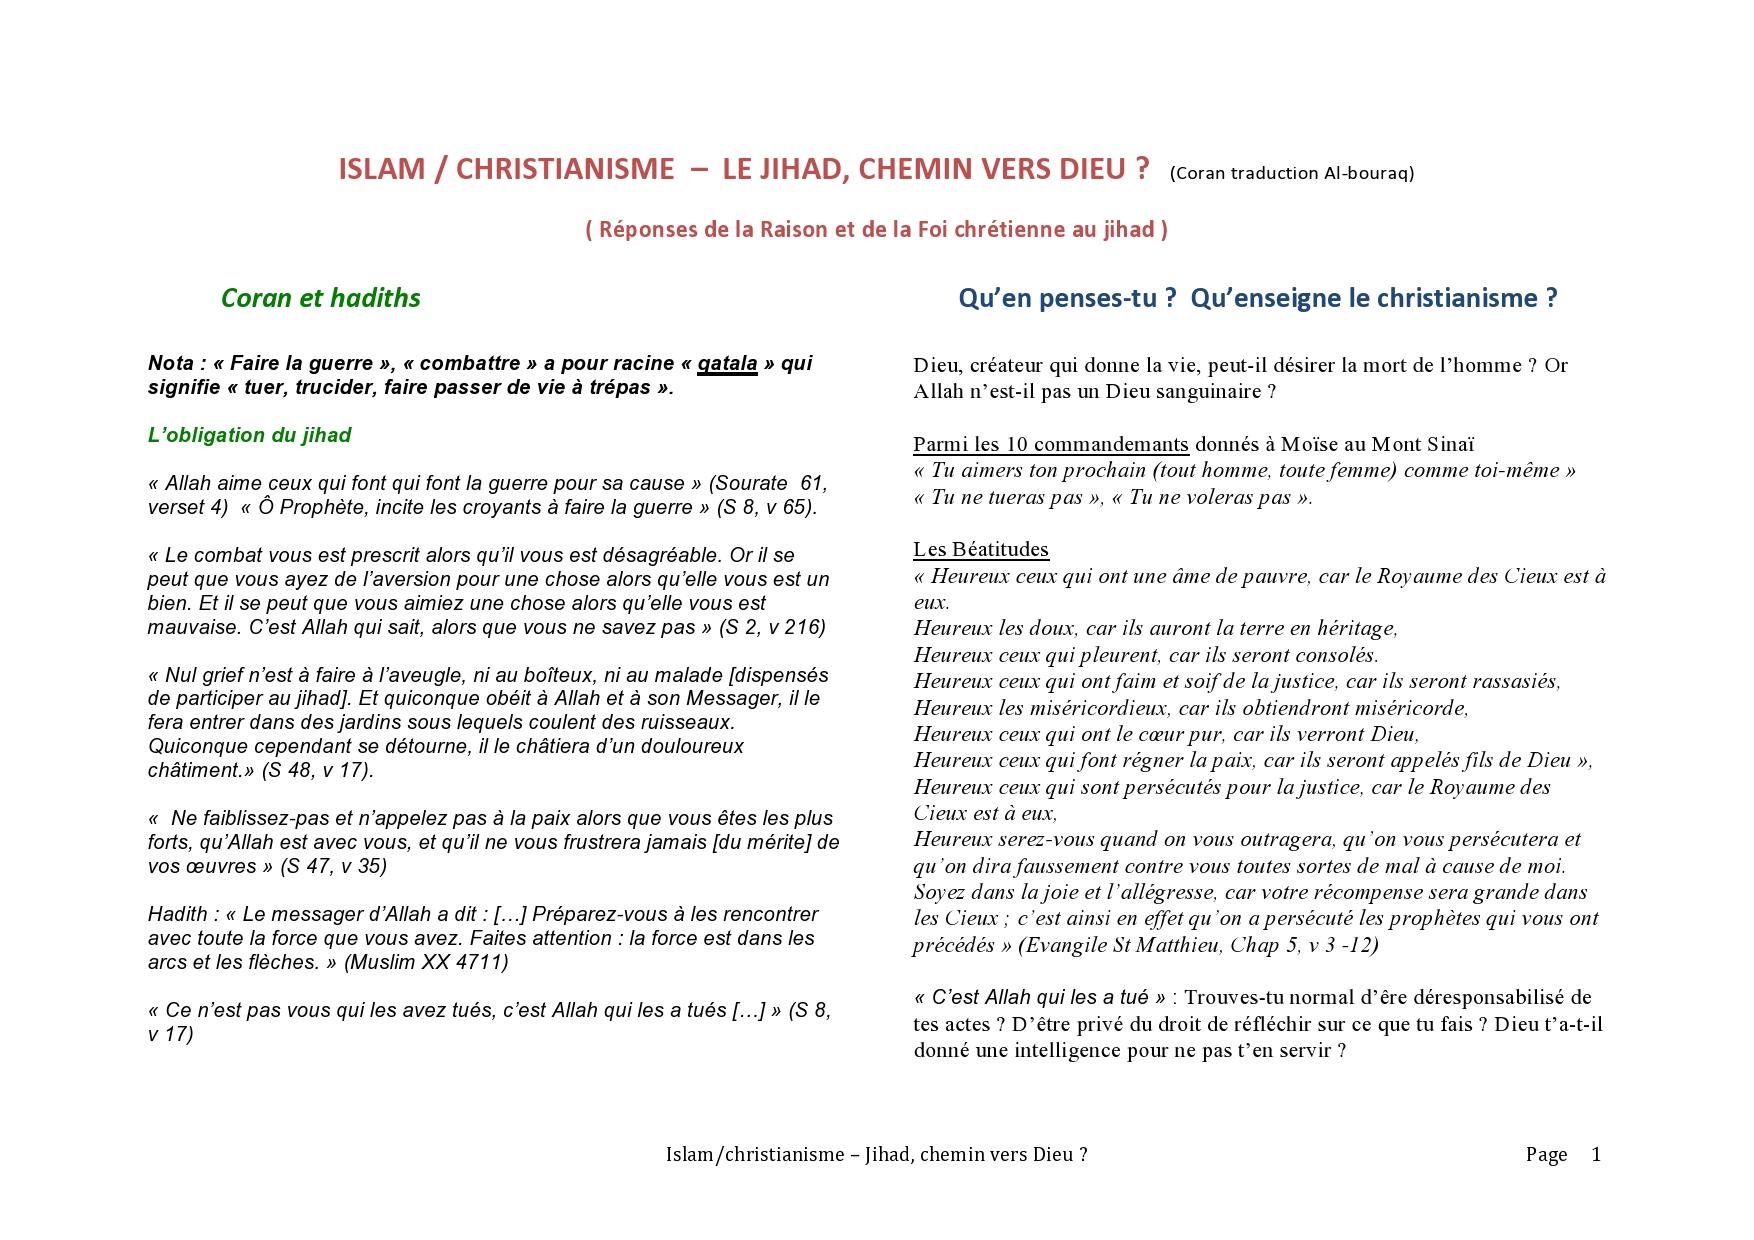 islam-christianisme-jihad-page0001